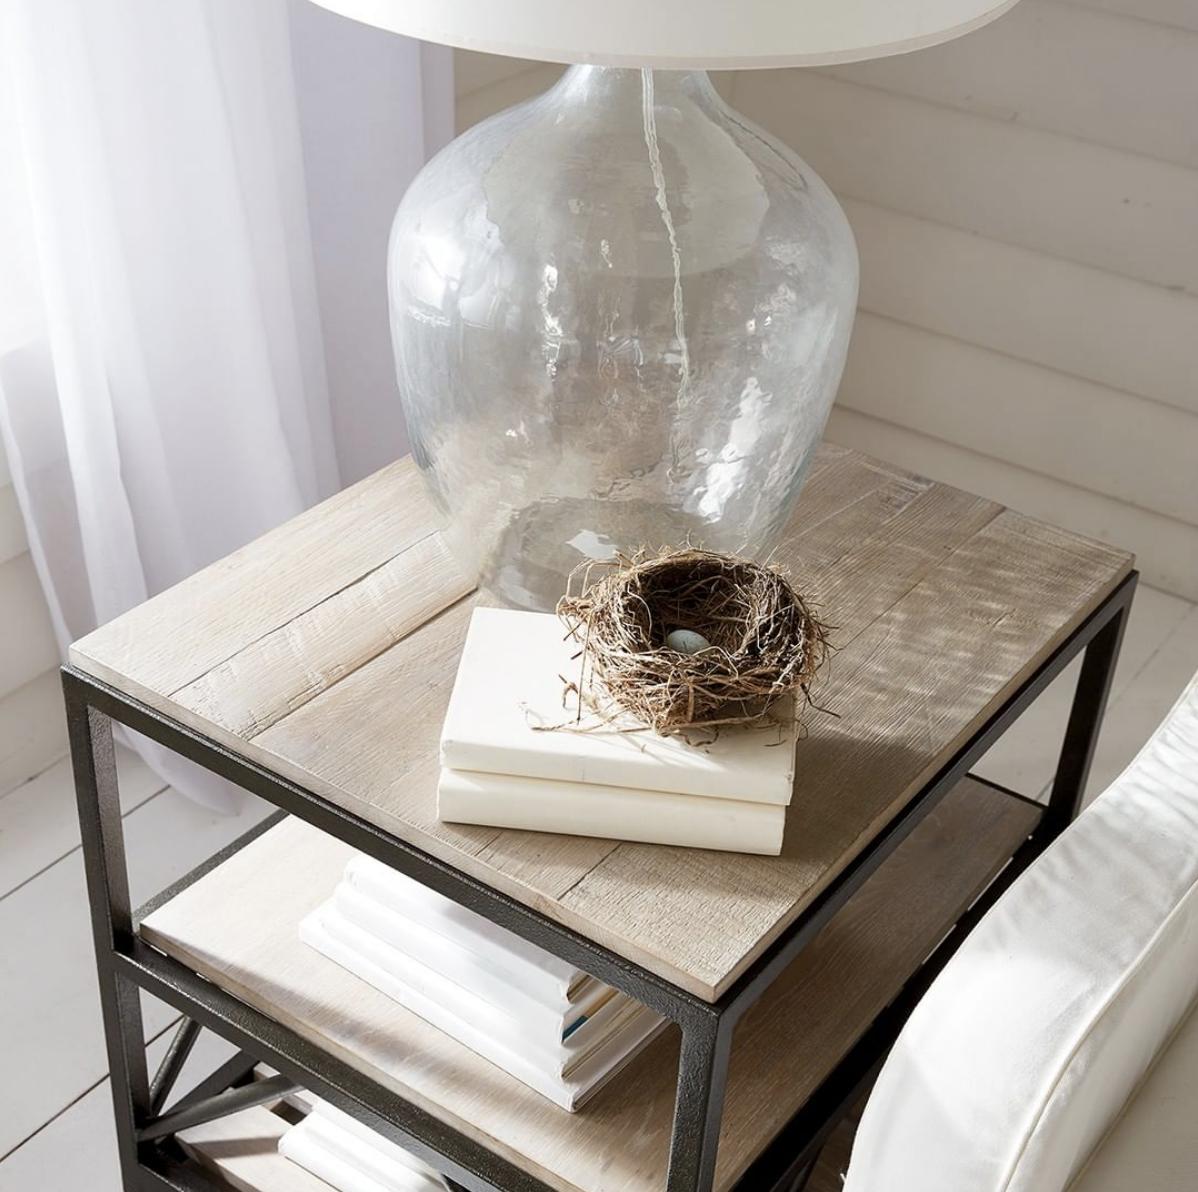 Veioză Plum Jar ️ ethanallenromania ethanallen lamp